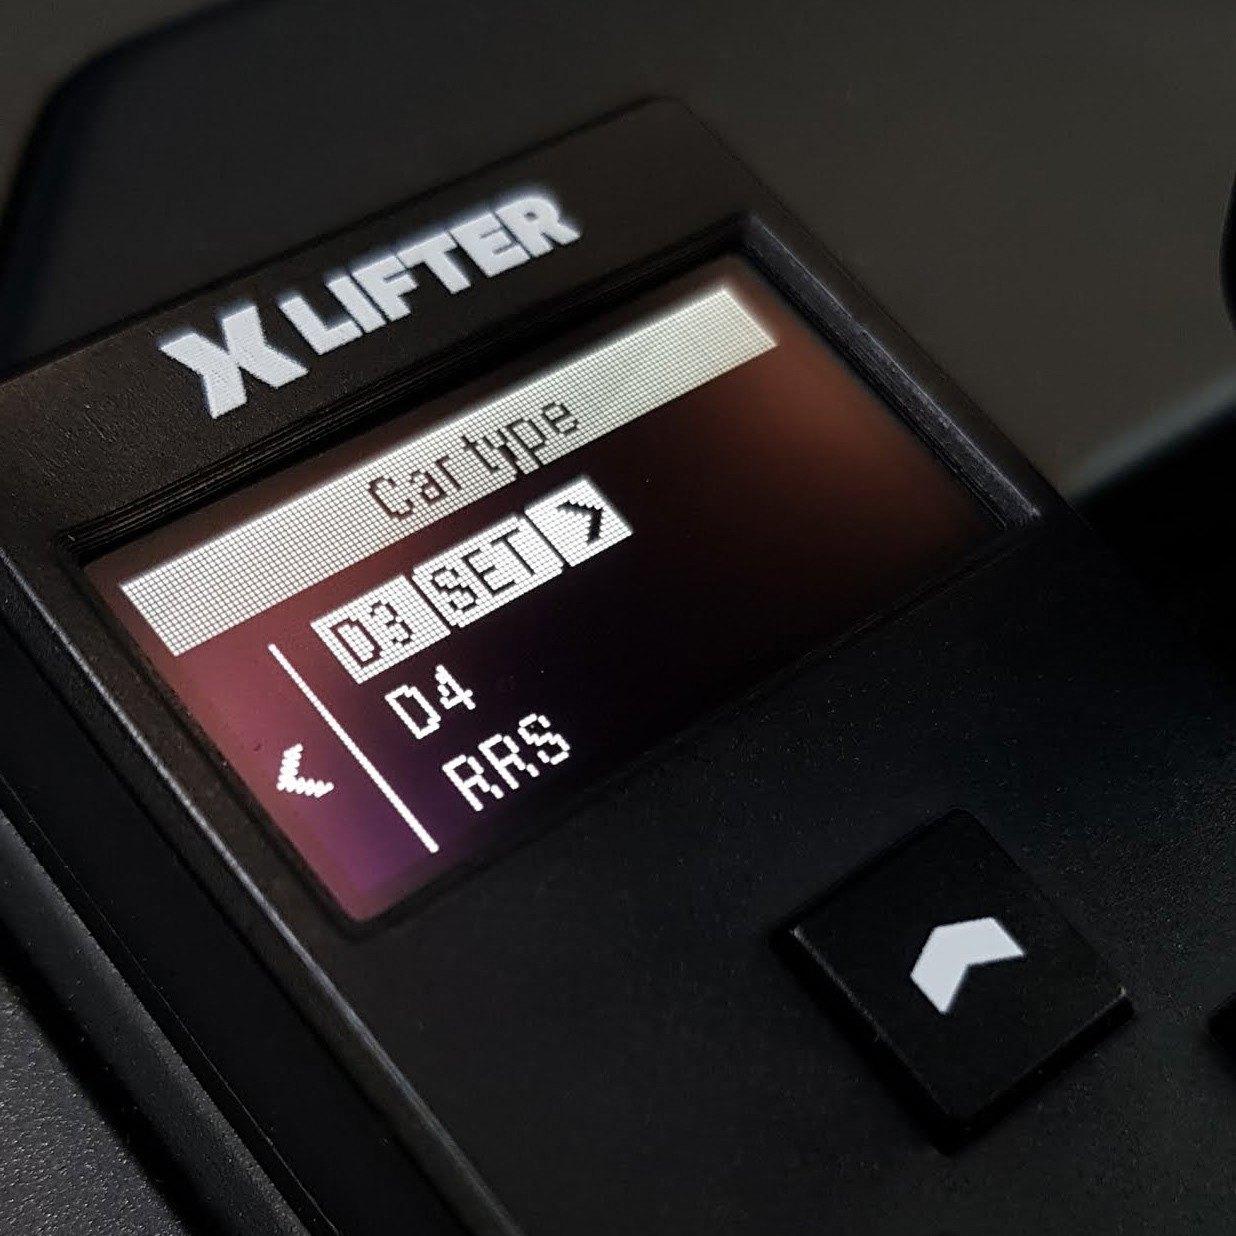 XLifter car type selector screen